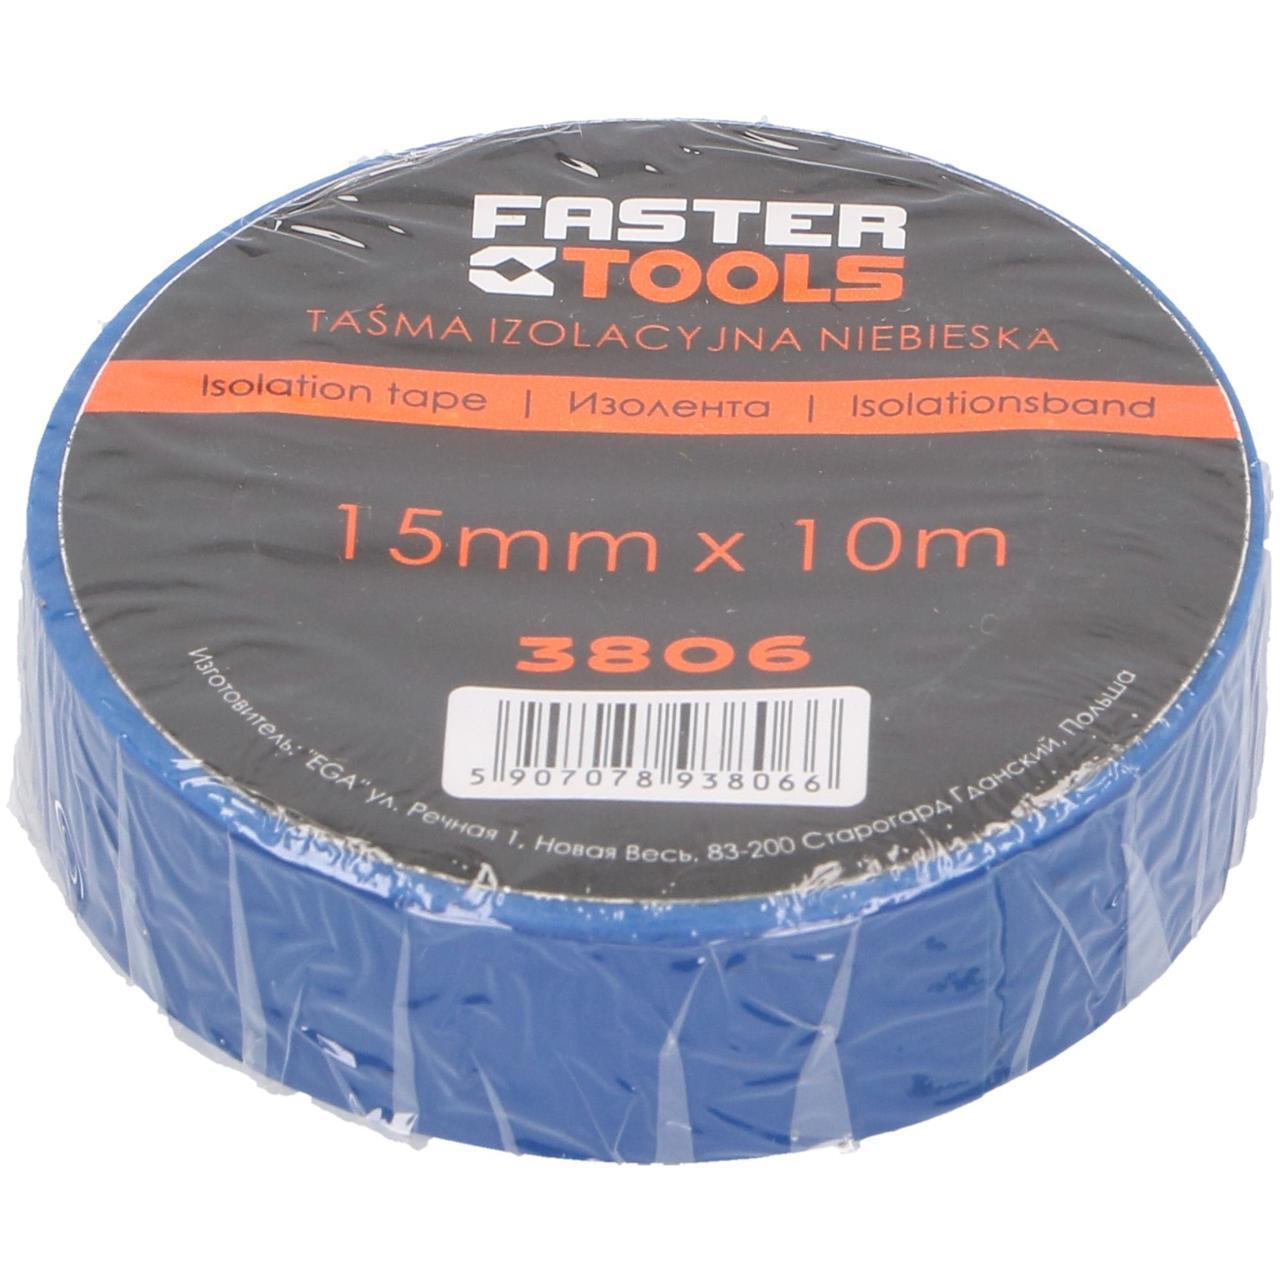 Ізострічка синя 15 мм, 10 м  FASTER TOOLS